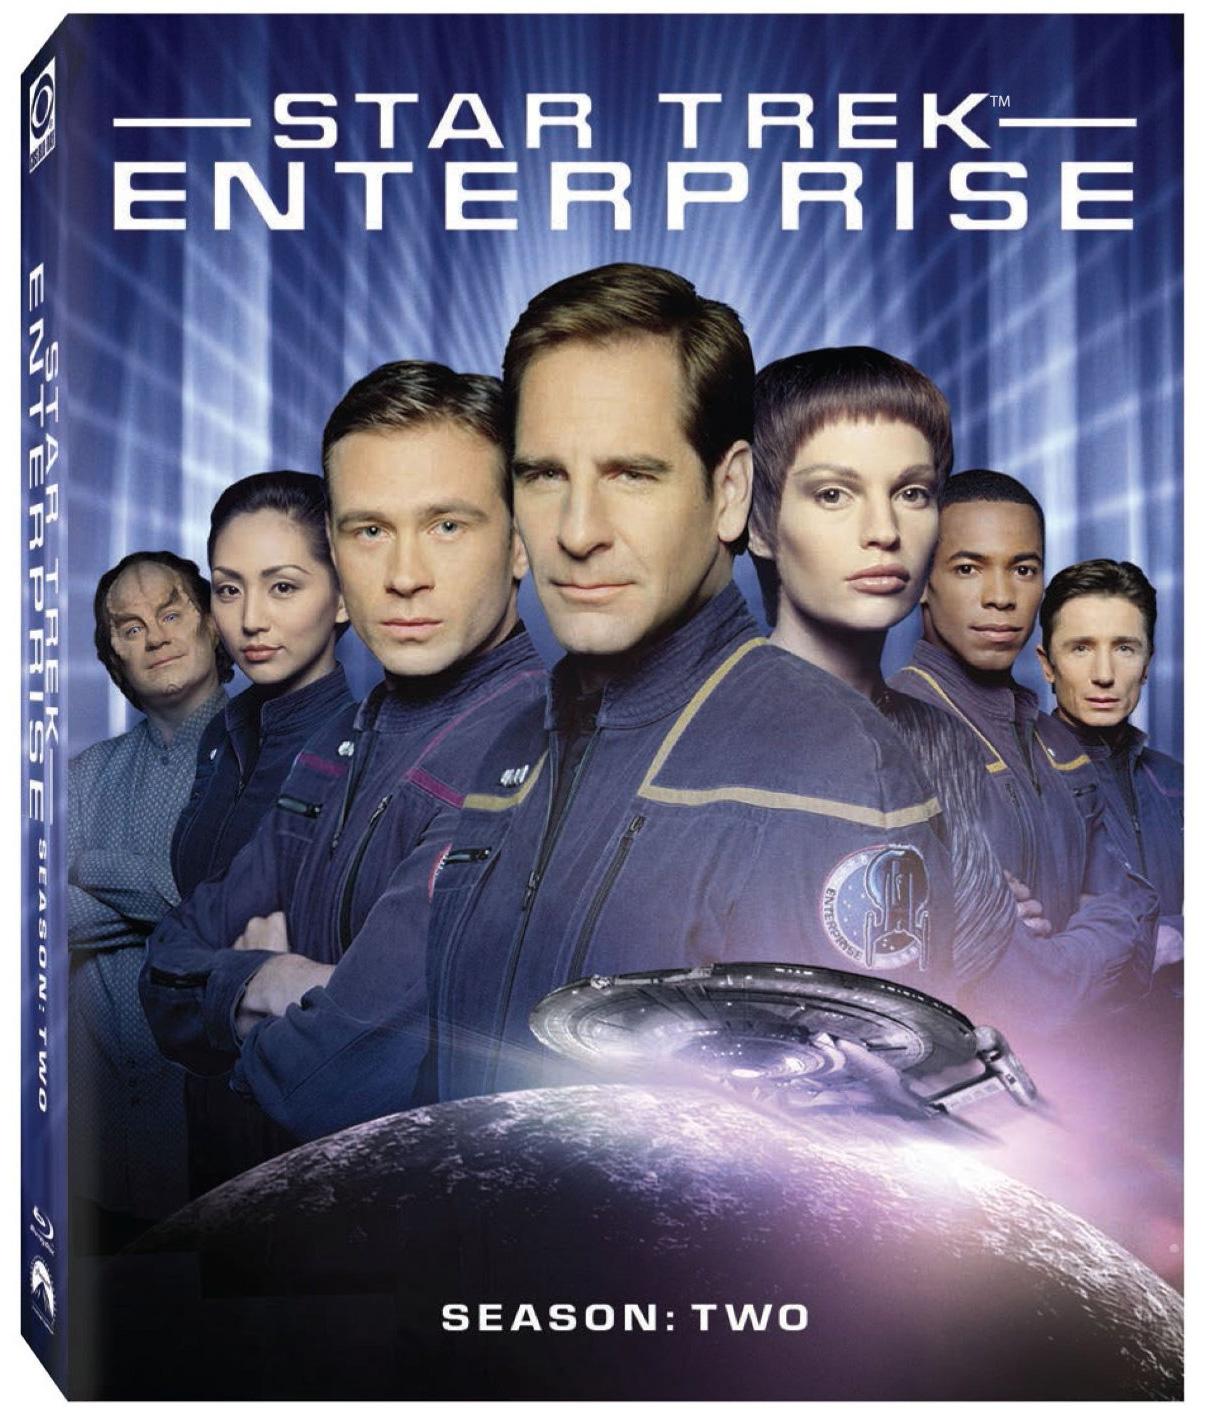 Enterprise season 2 Blu-ray cover - Jolene Blalock as t'pol and Scott Bakula as Jonathan Archer